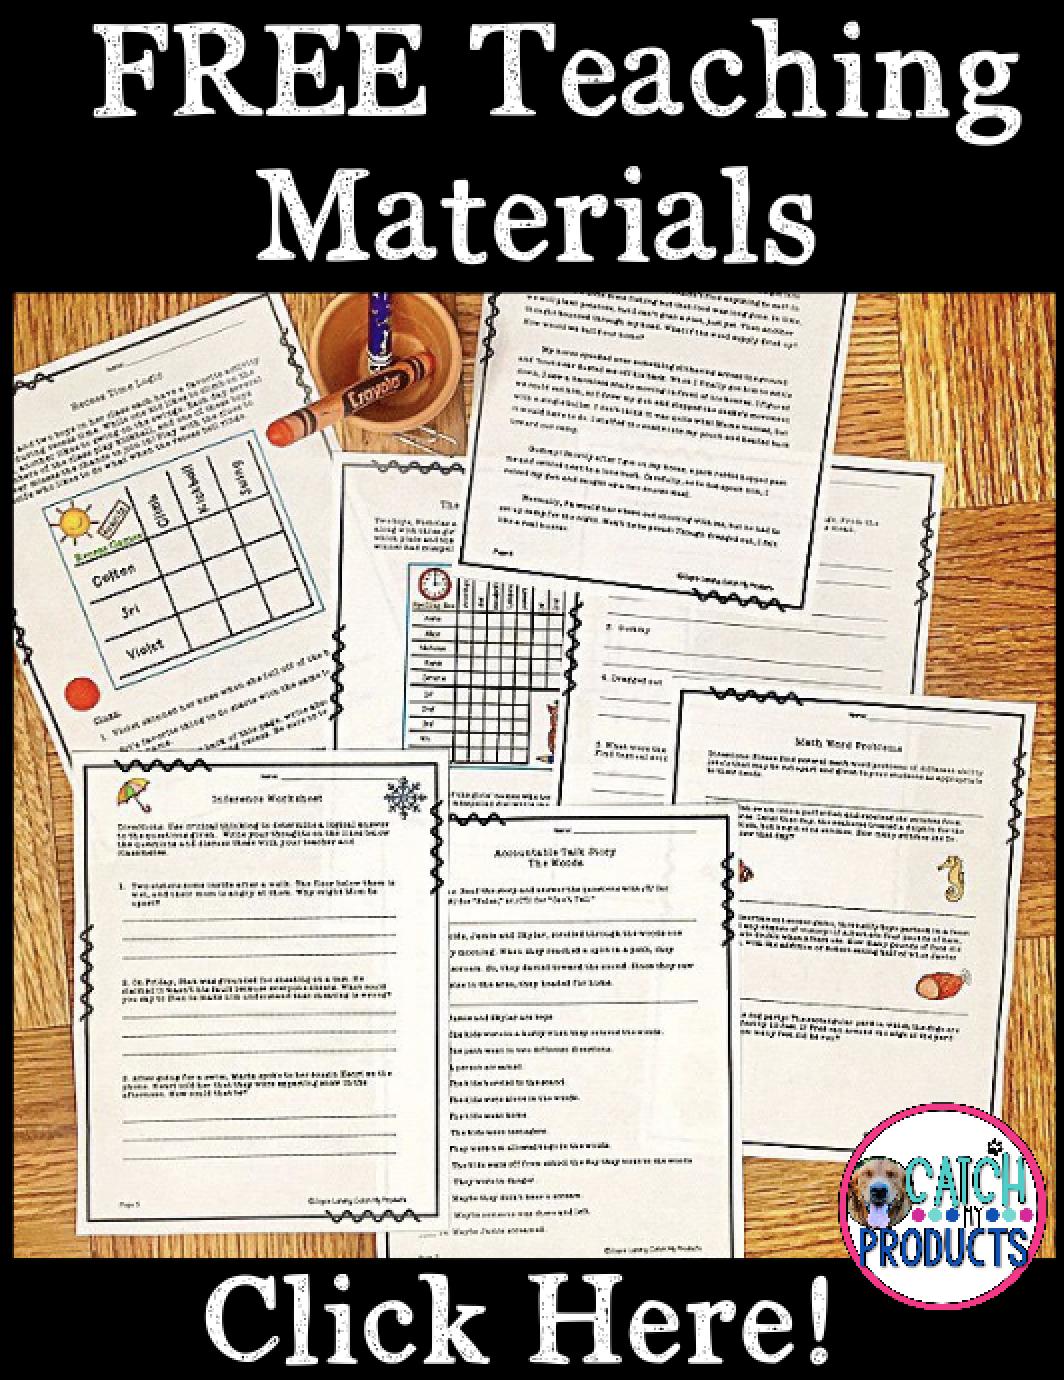 Teachers Free Fun Teaching Printables For Kids Learning